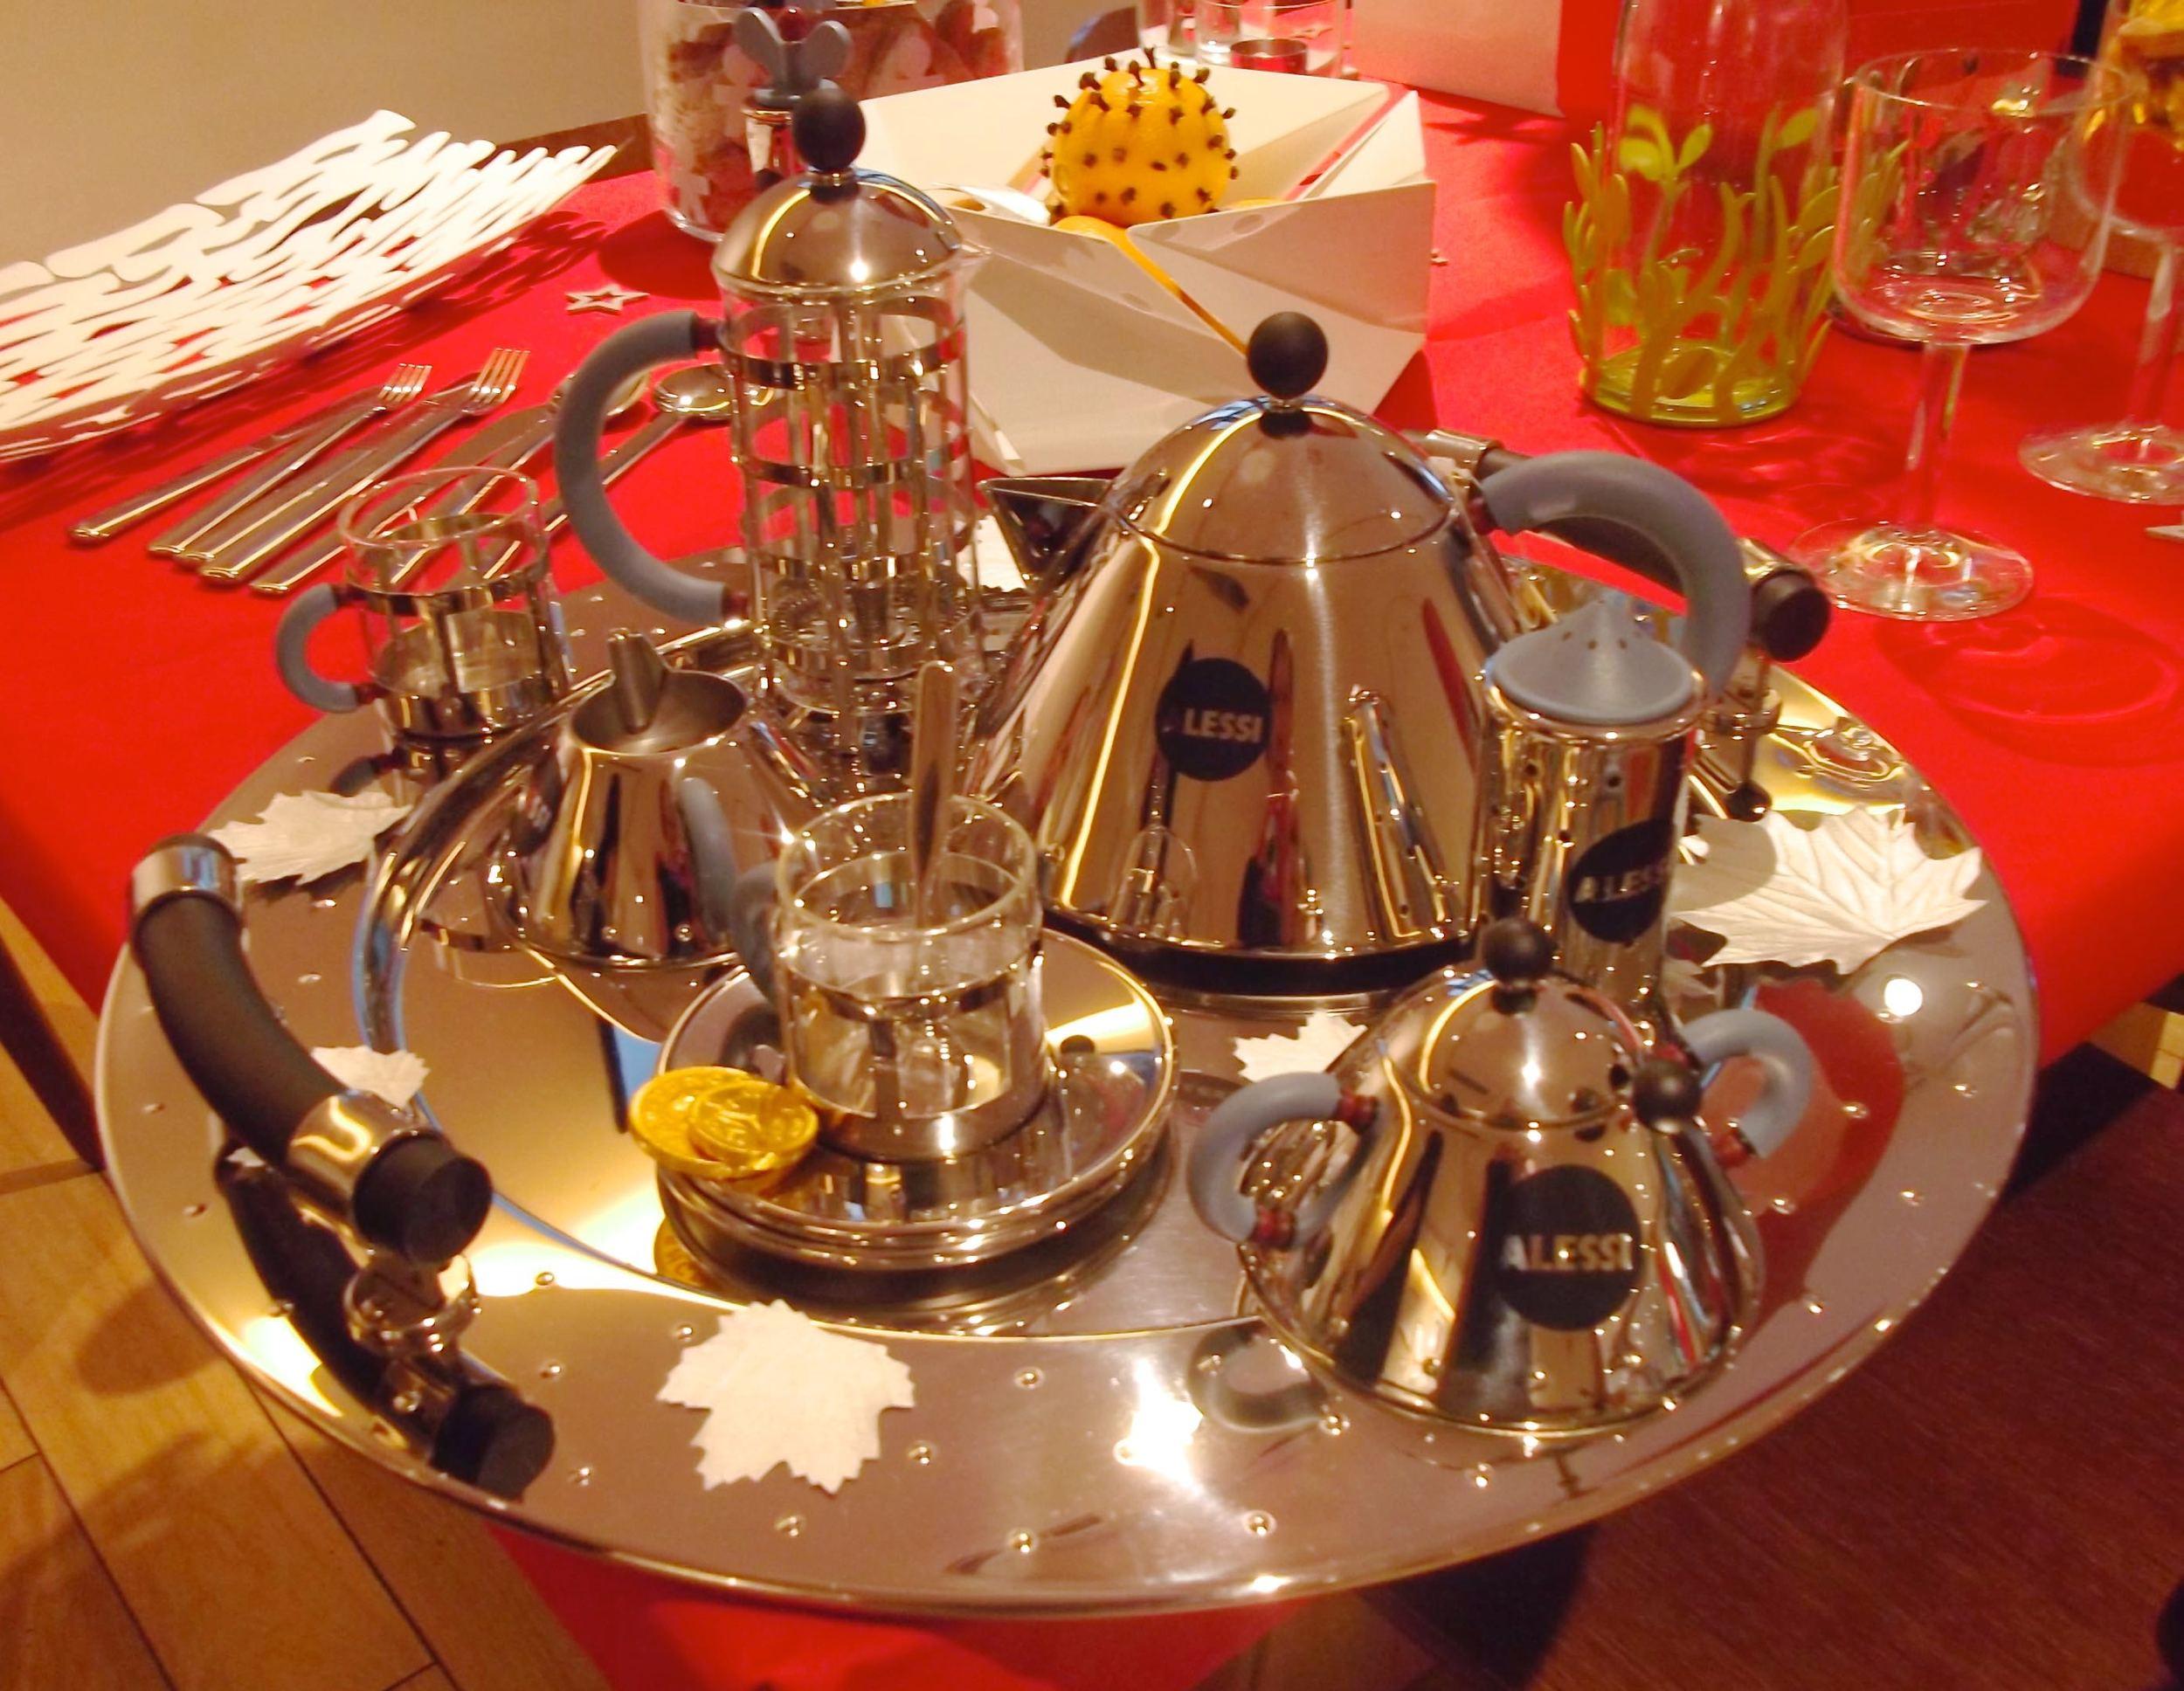 BOMBÉ TEA AND COFFEE SERVICE